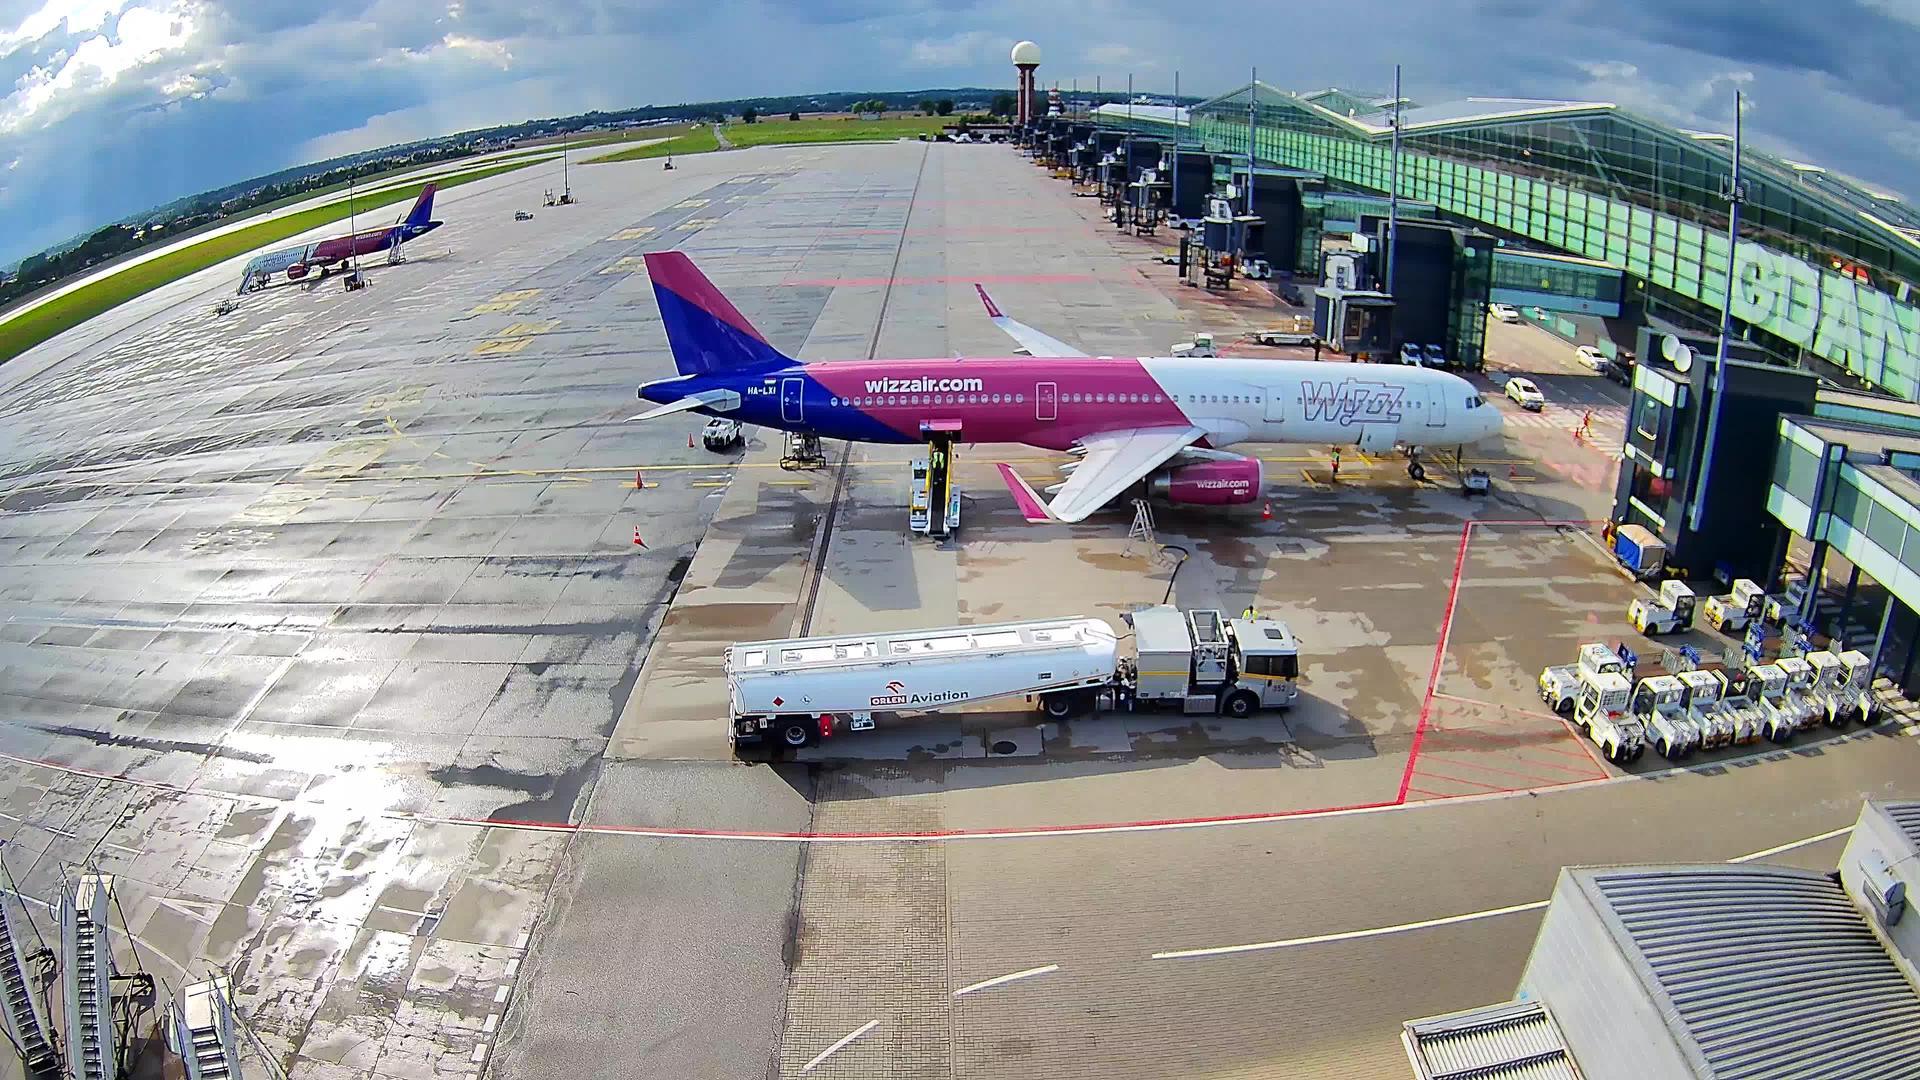 Webcam Gdańsk: Lech Walesa Airport